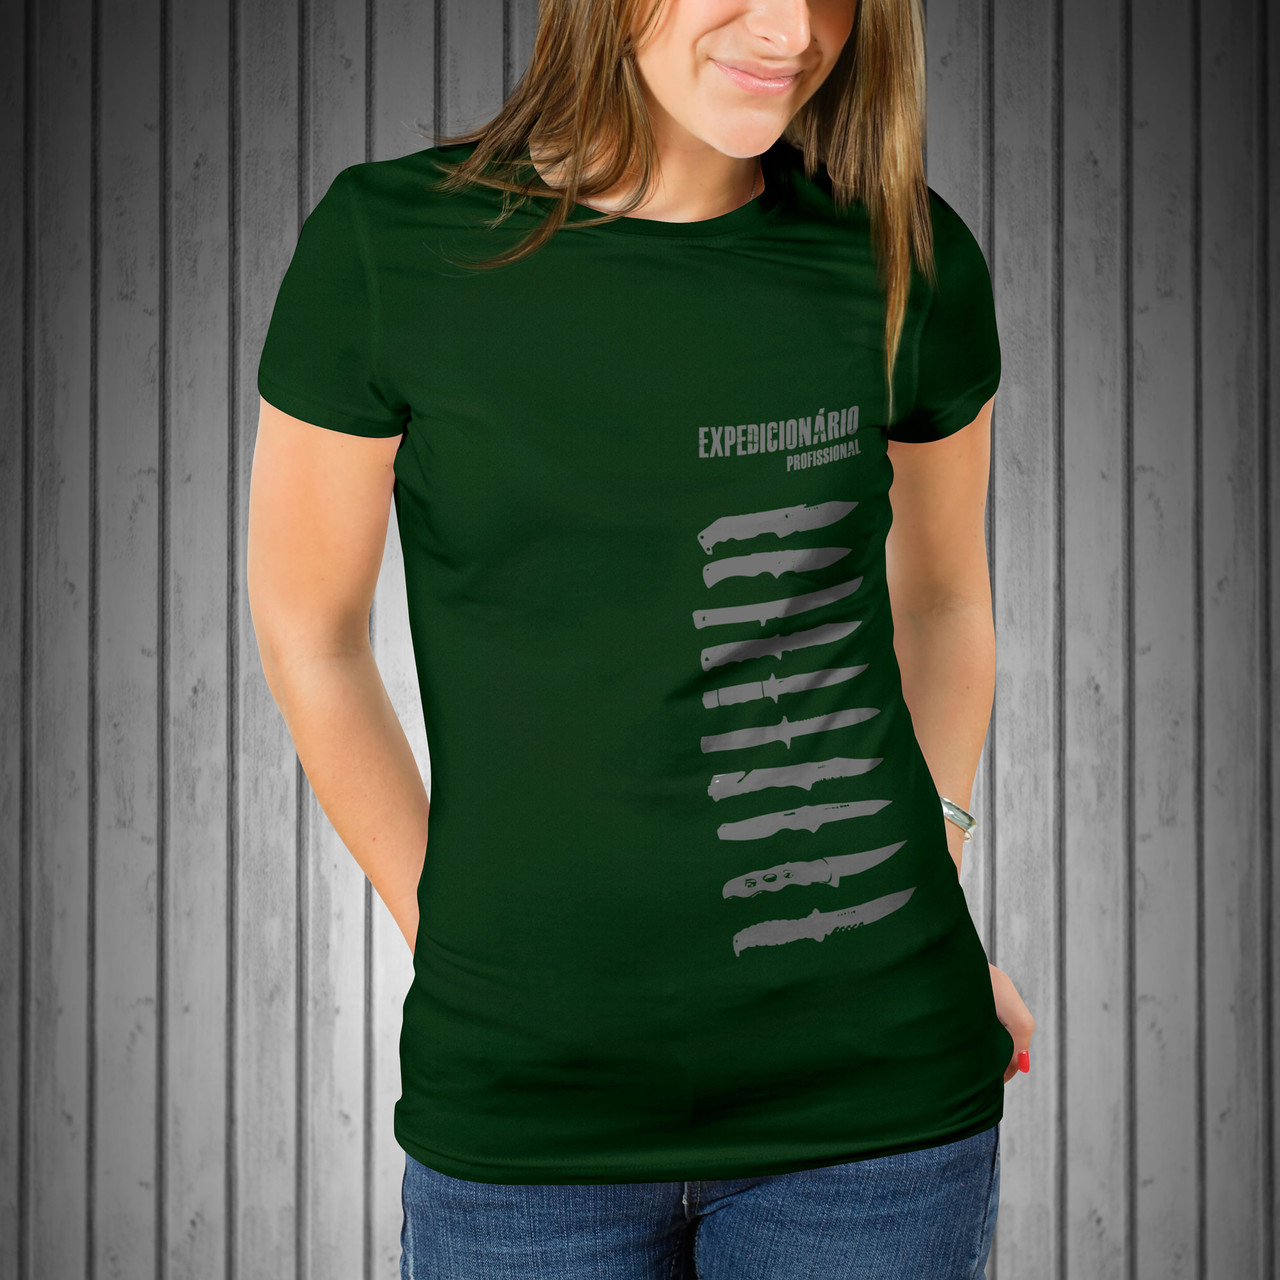 Female-Tshirt-Mockup-FrontVerde2 (1)